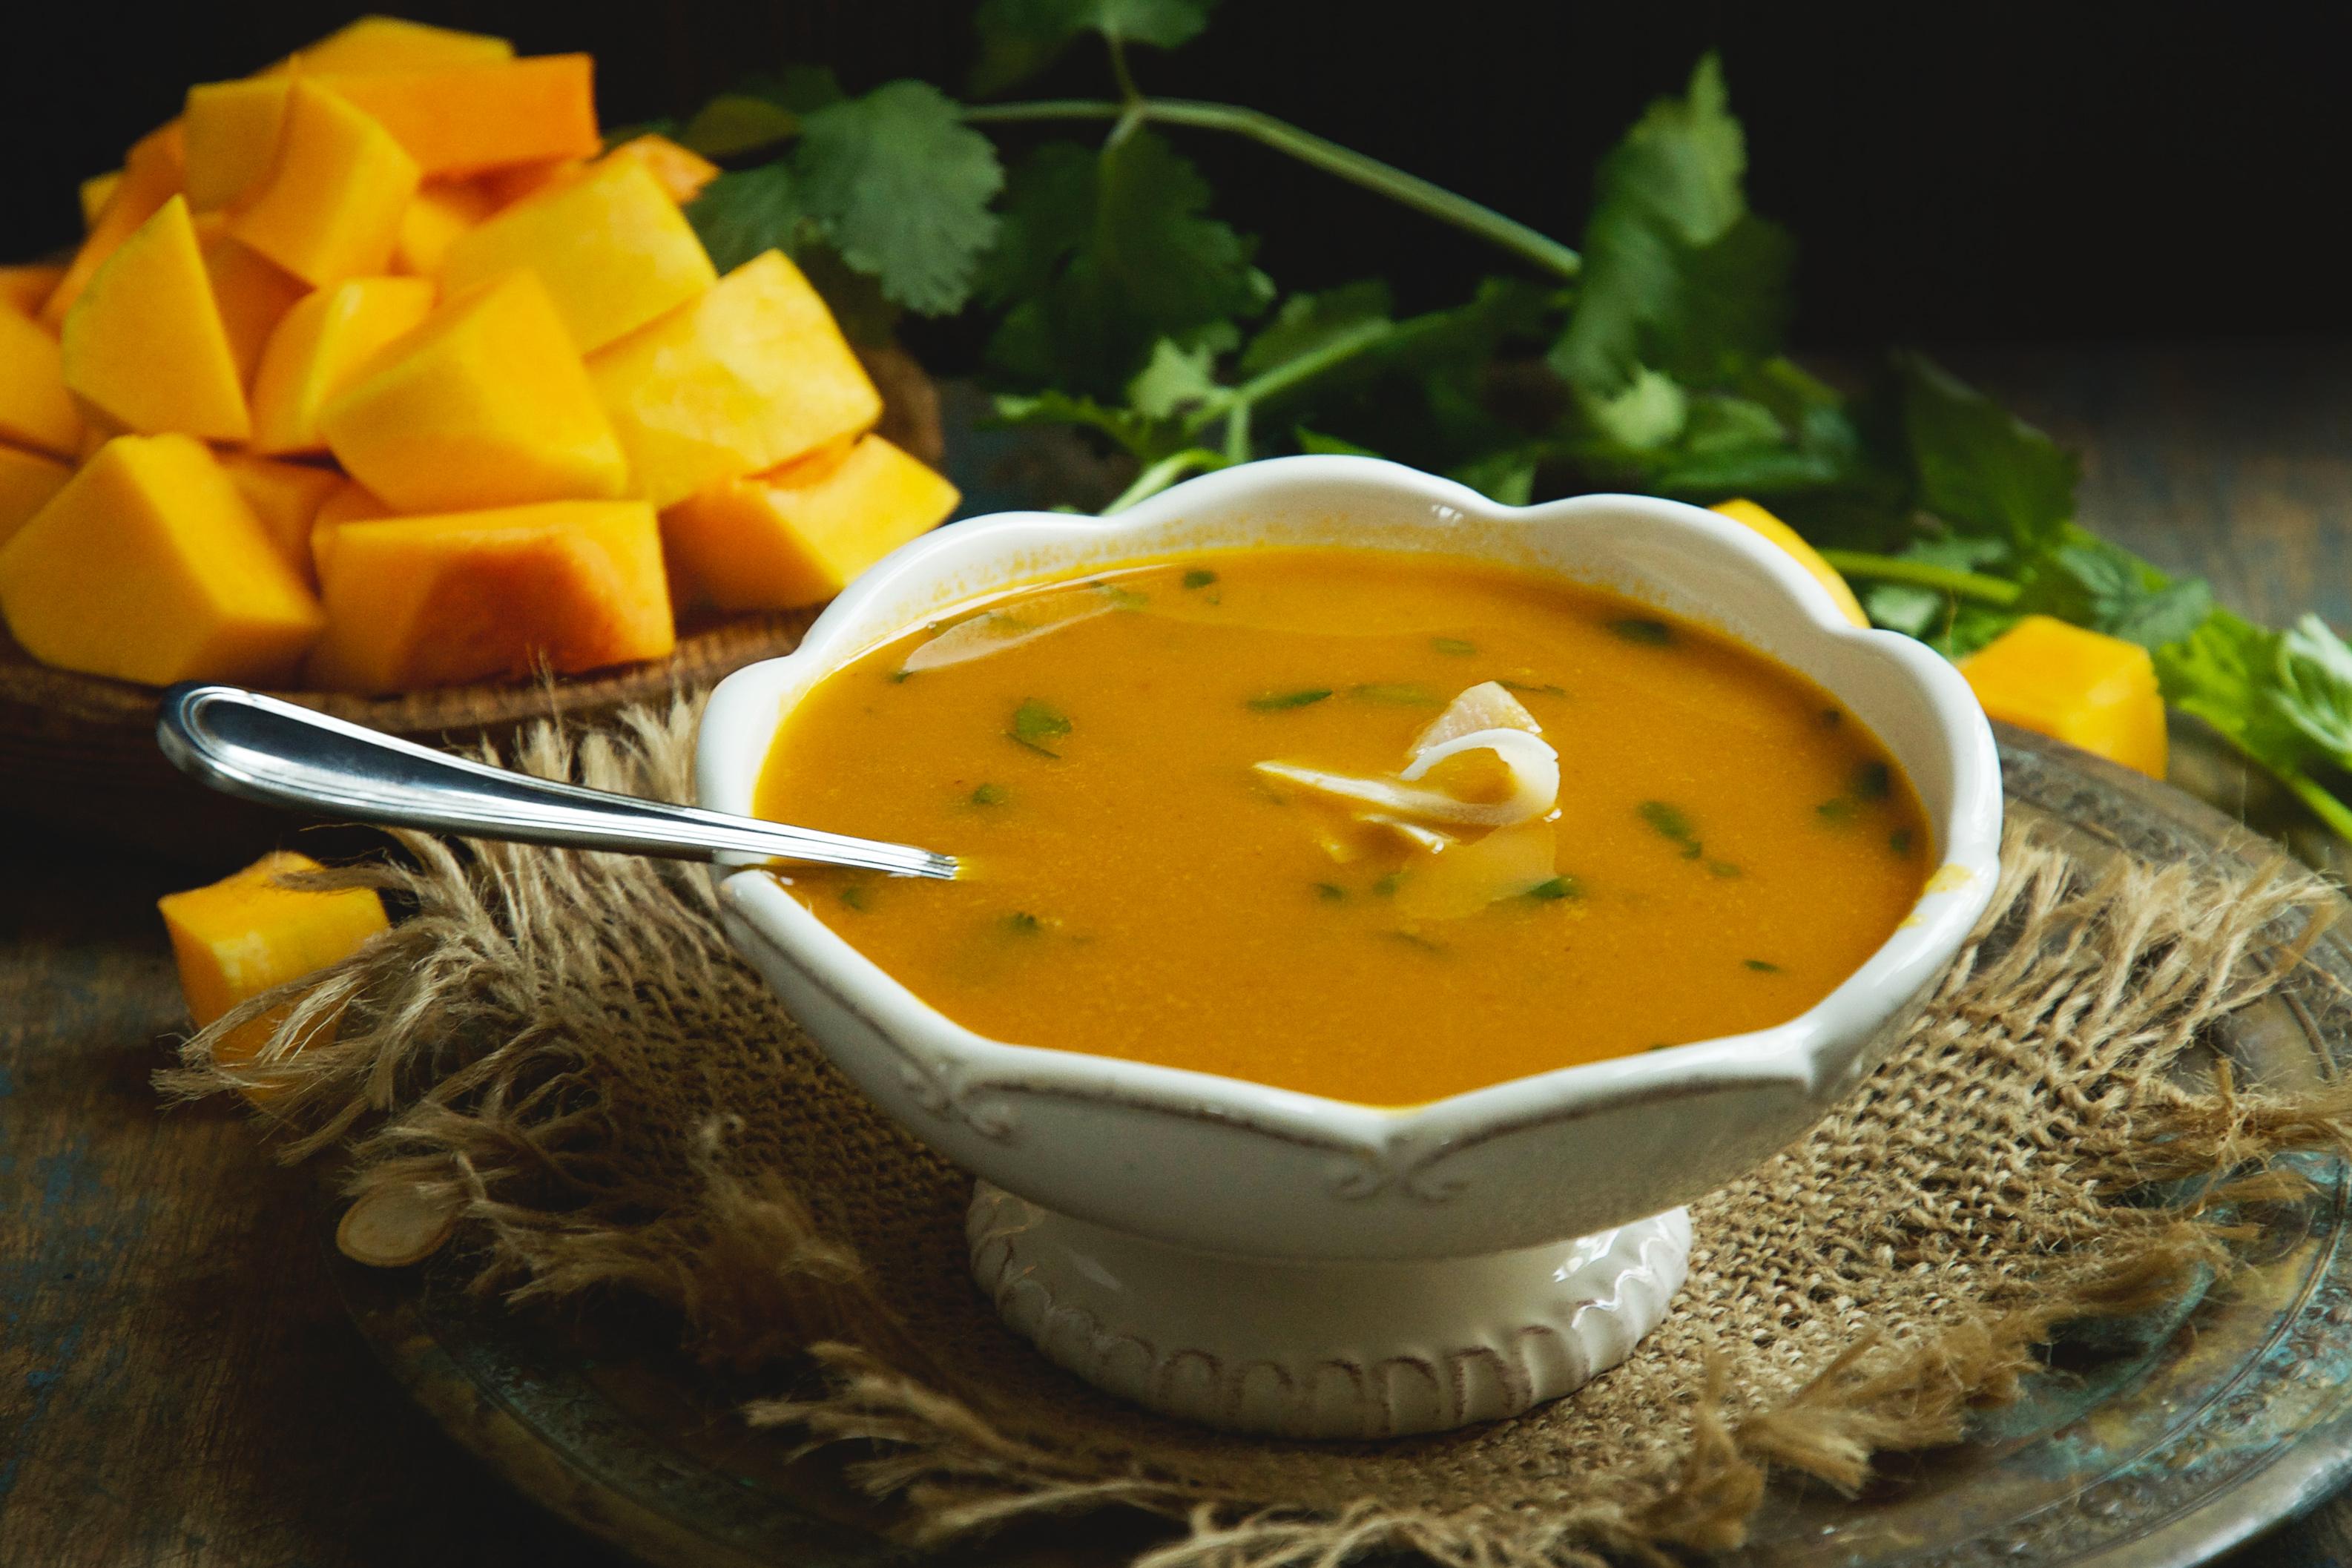 Low-Carb Thai Curried Butternut Squash Soup